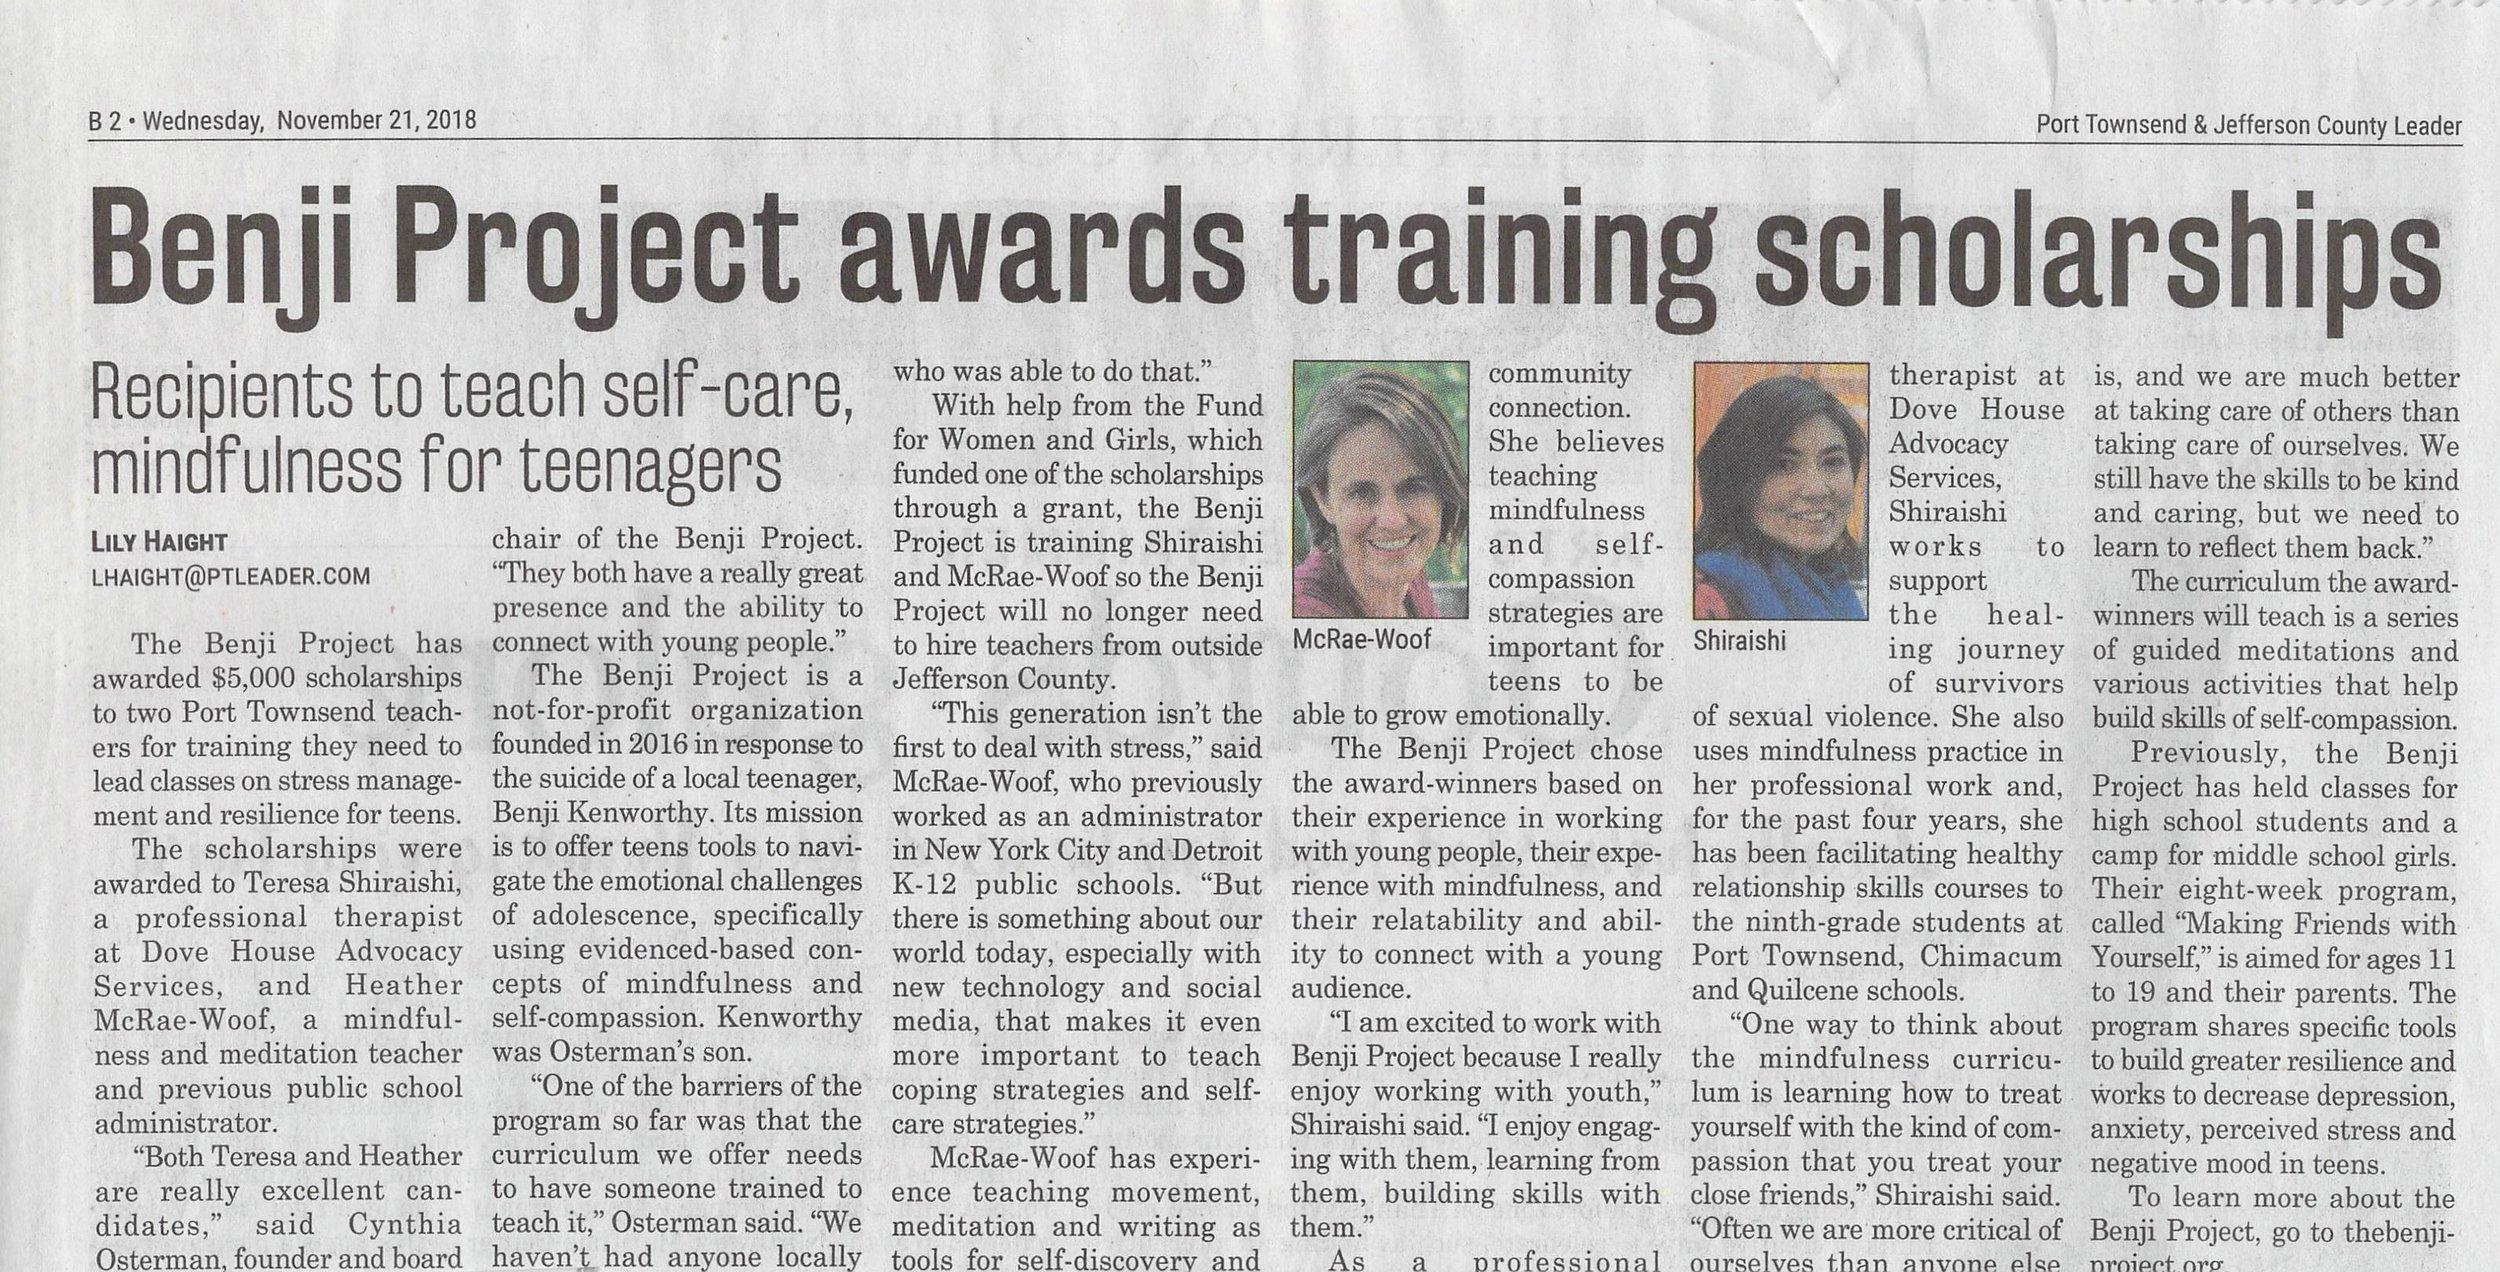 Scholarship Awards - Port Townsend Leader.jpg